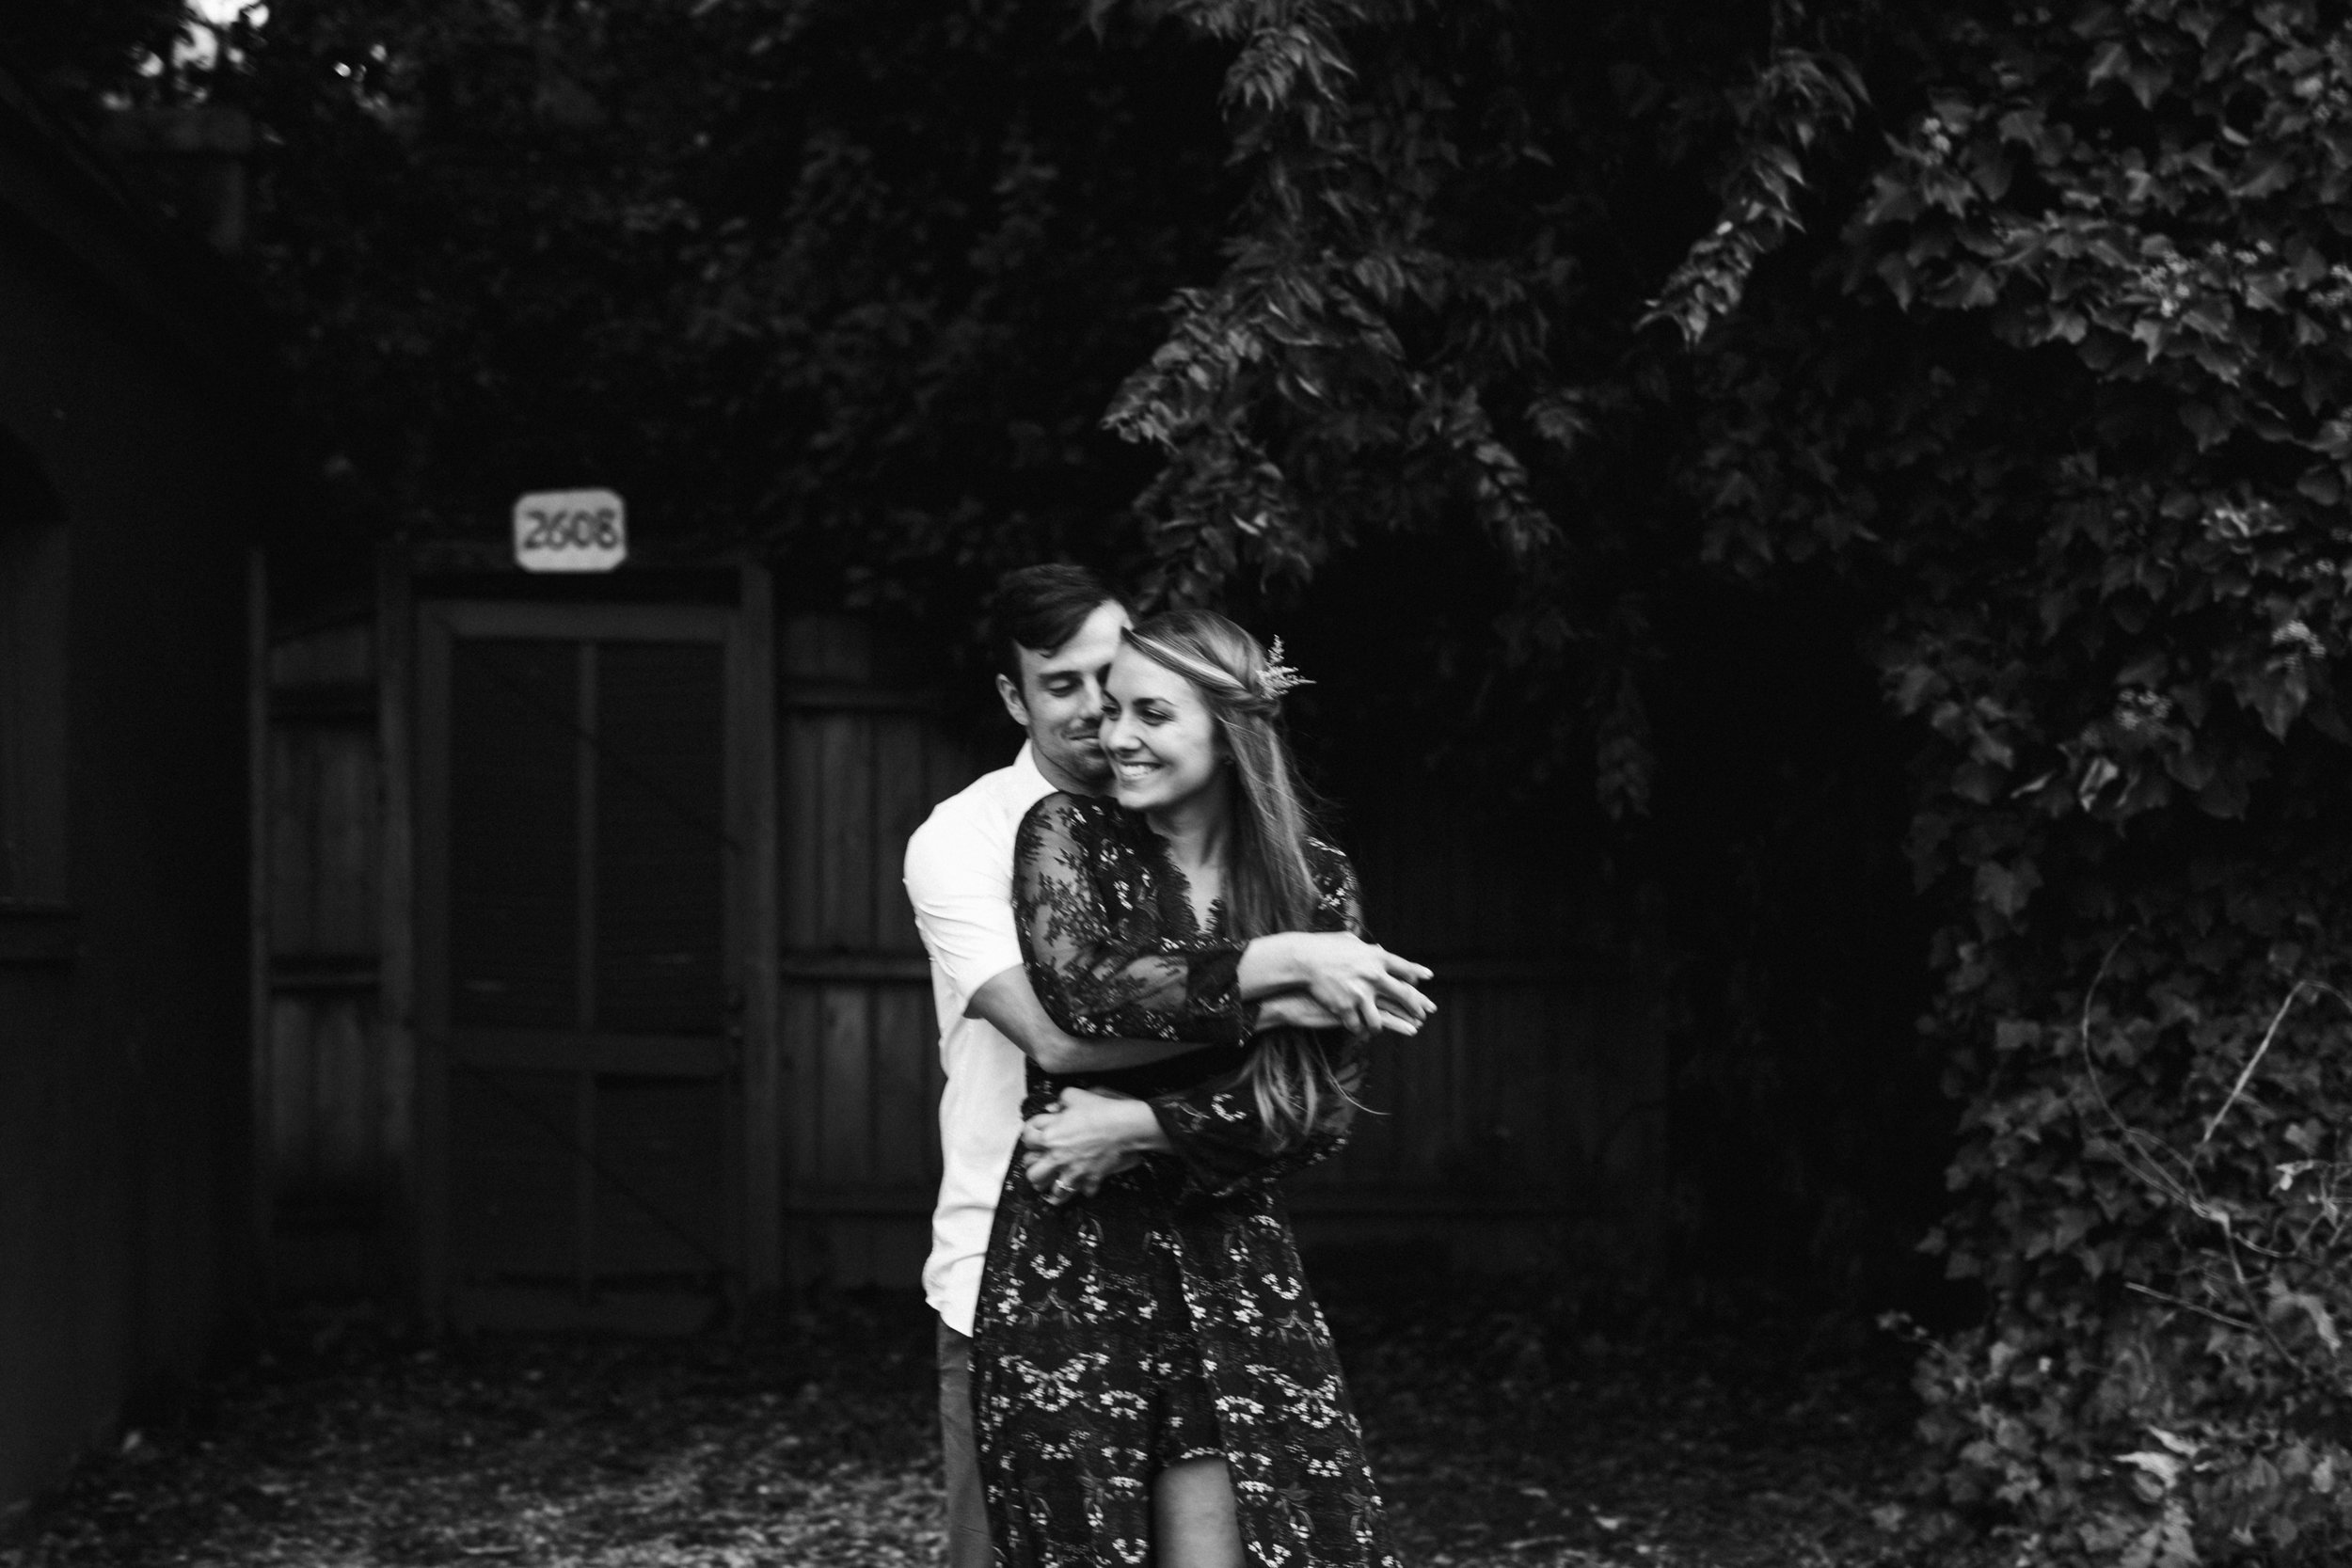 richmond_wedding_photographer-18.jpg